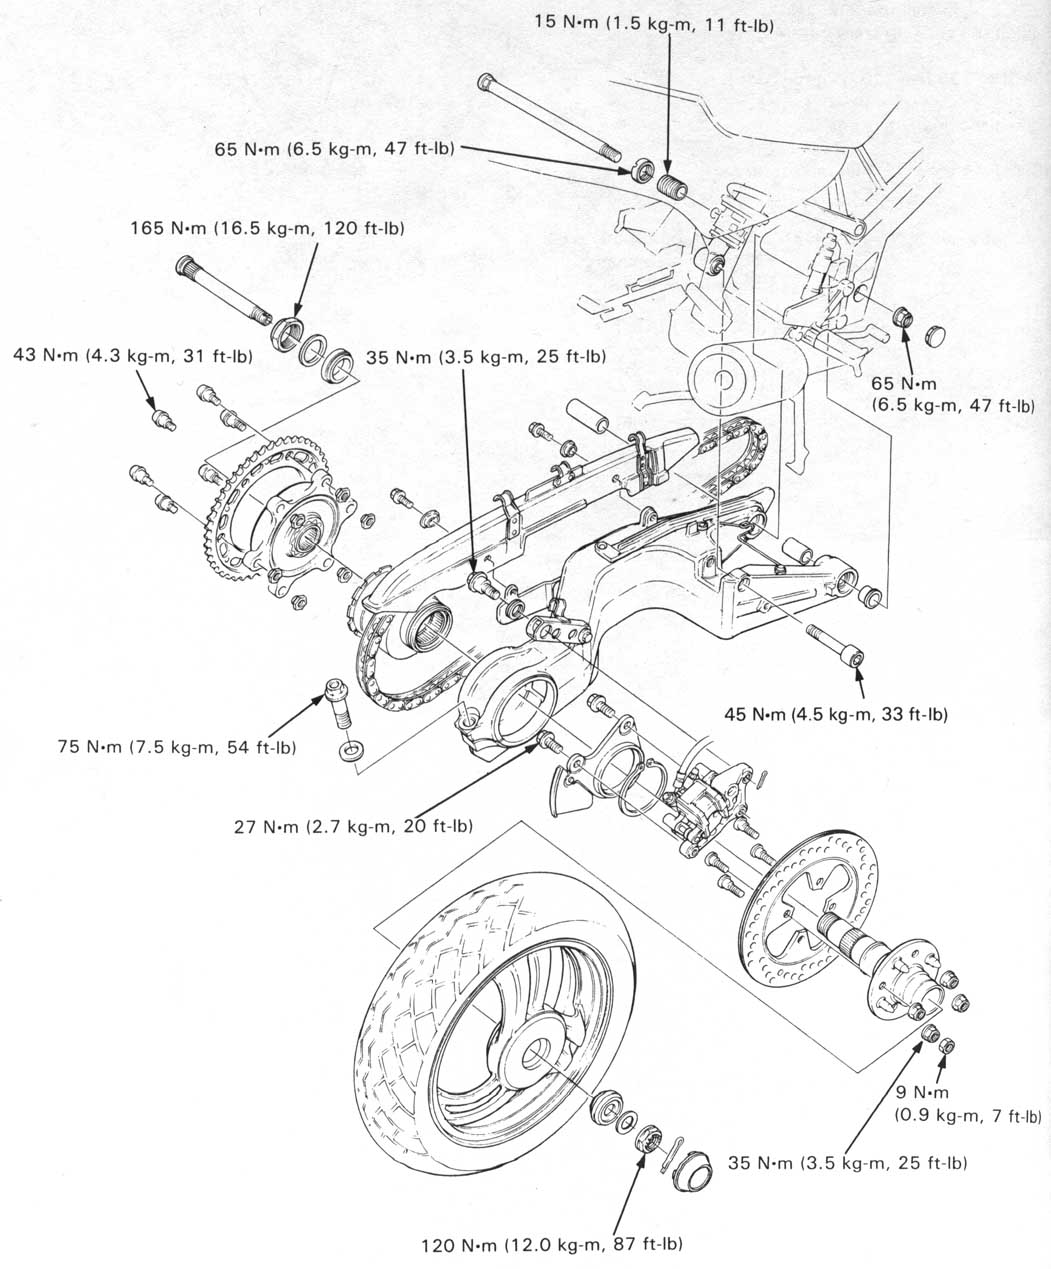 Honda Nt650 Service Manual Section 13 Rear Wheel Suspension